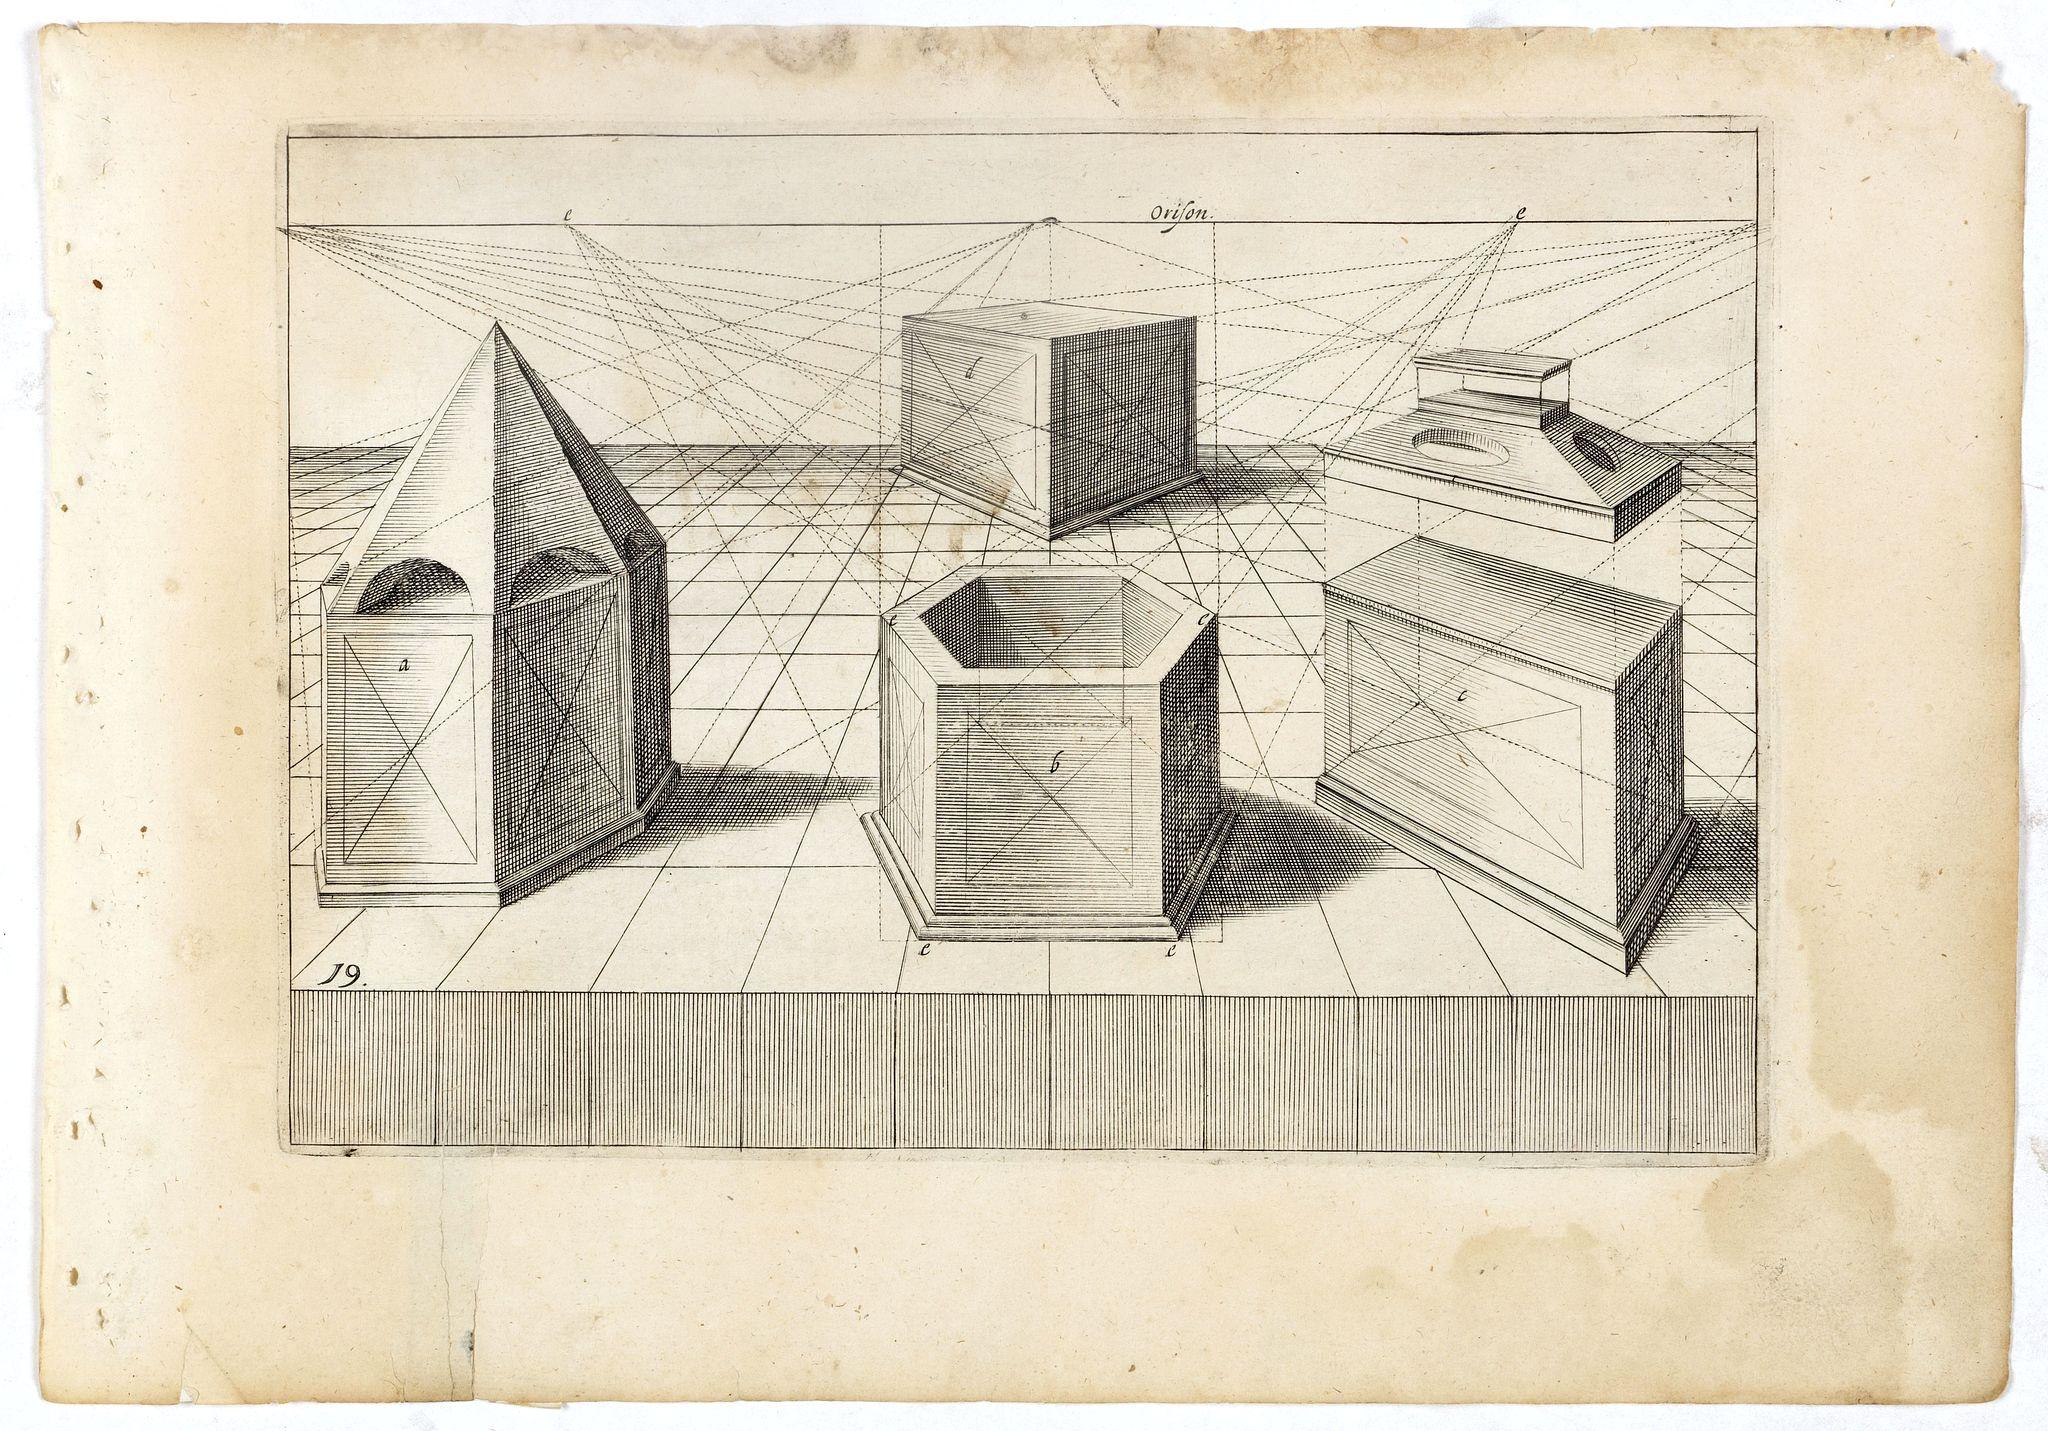 VREDEMAN DE VRIES, J. / HONDIUS, H. -  Perspective print by Vredeman de Vries. 19.